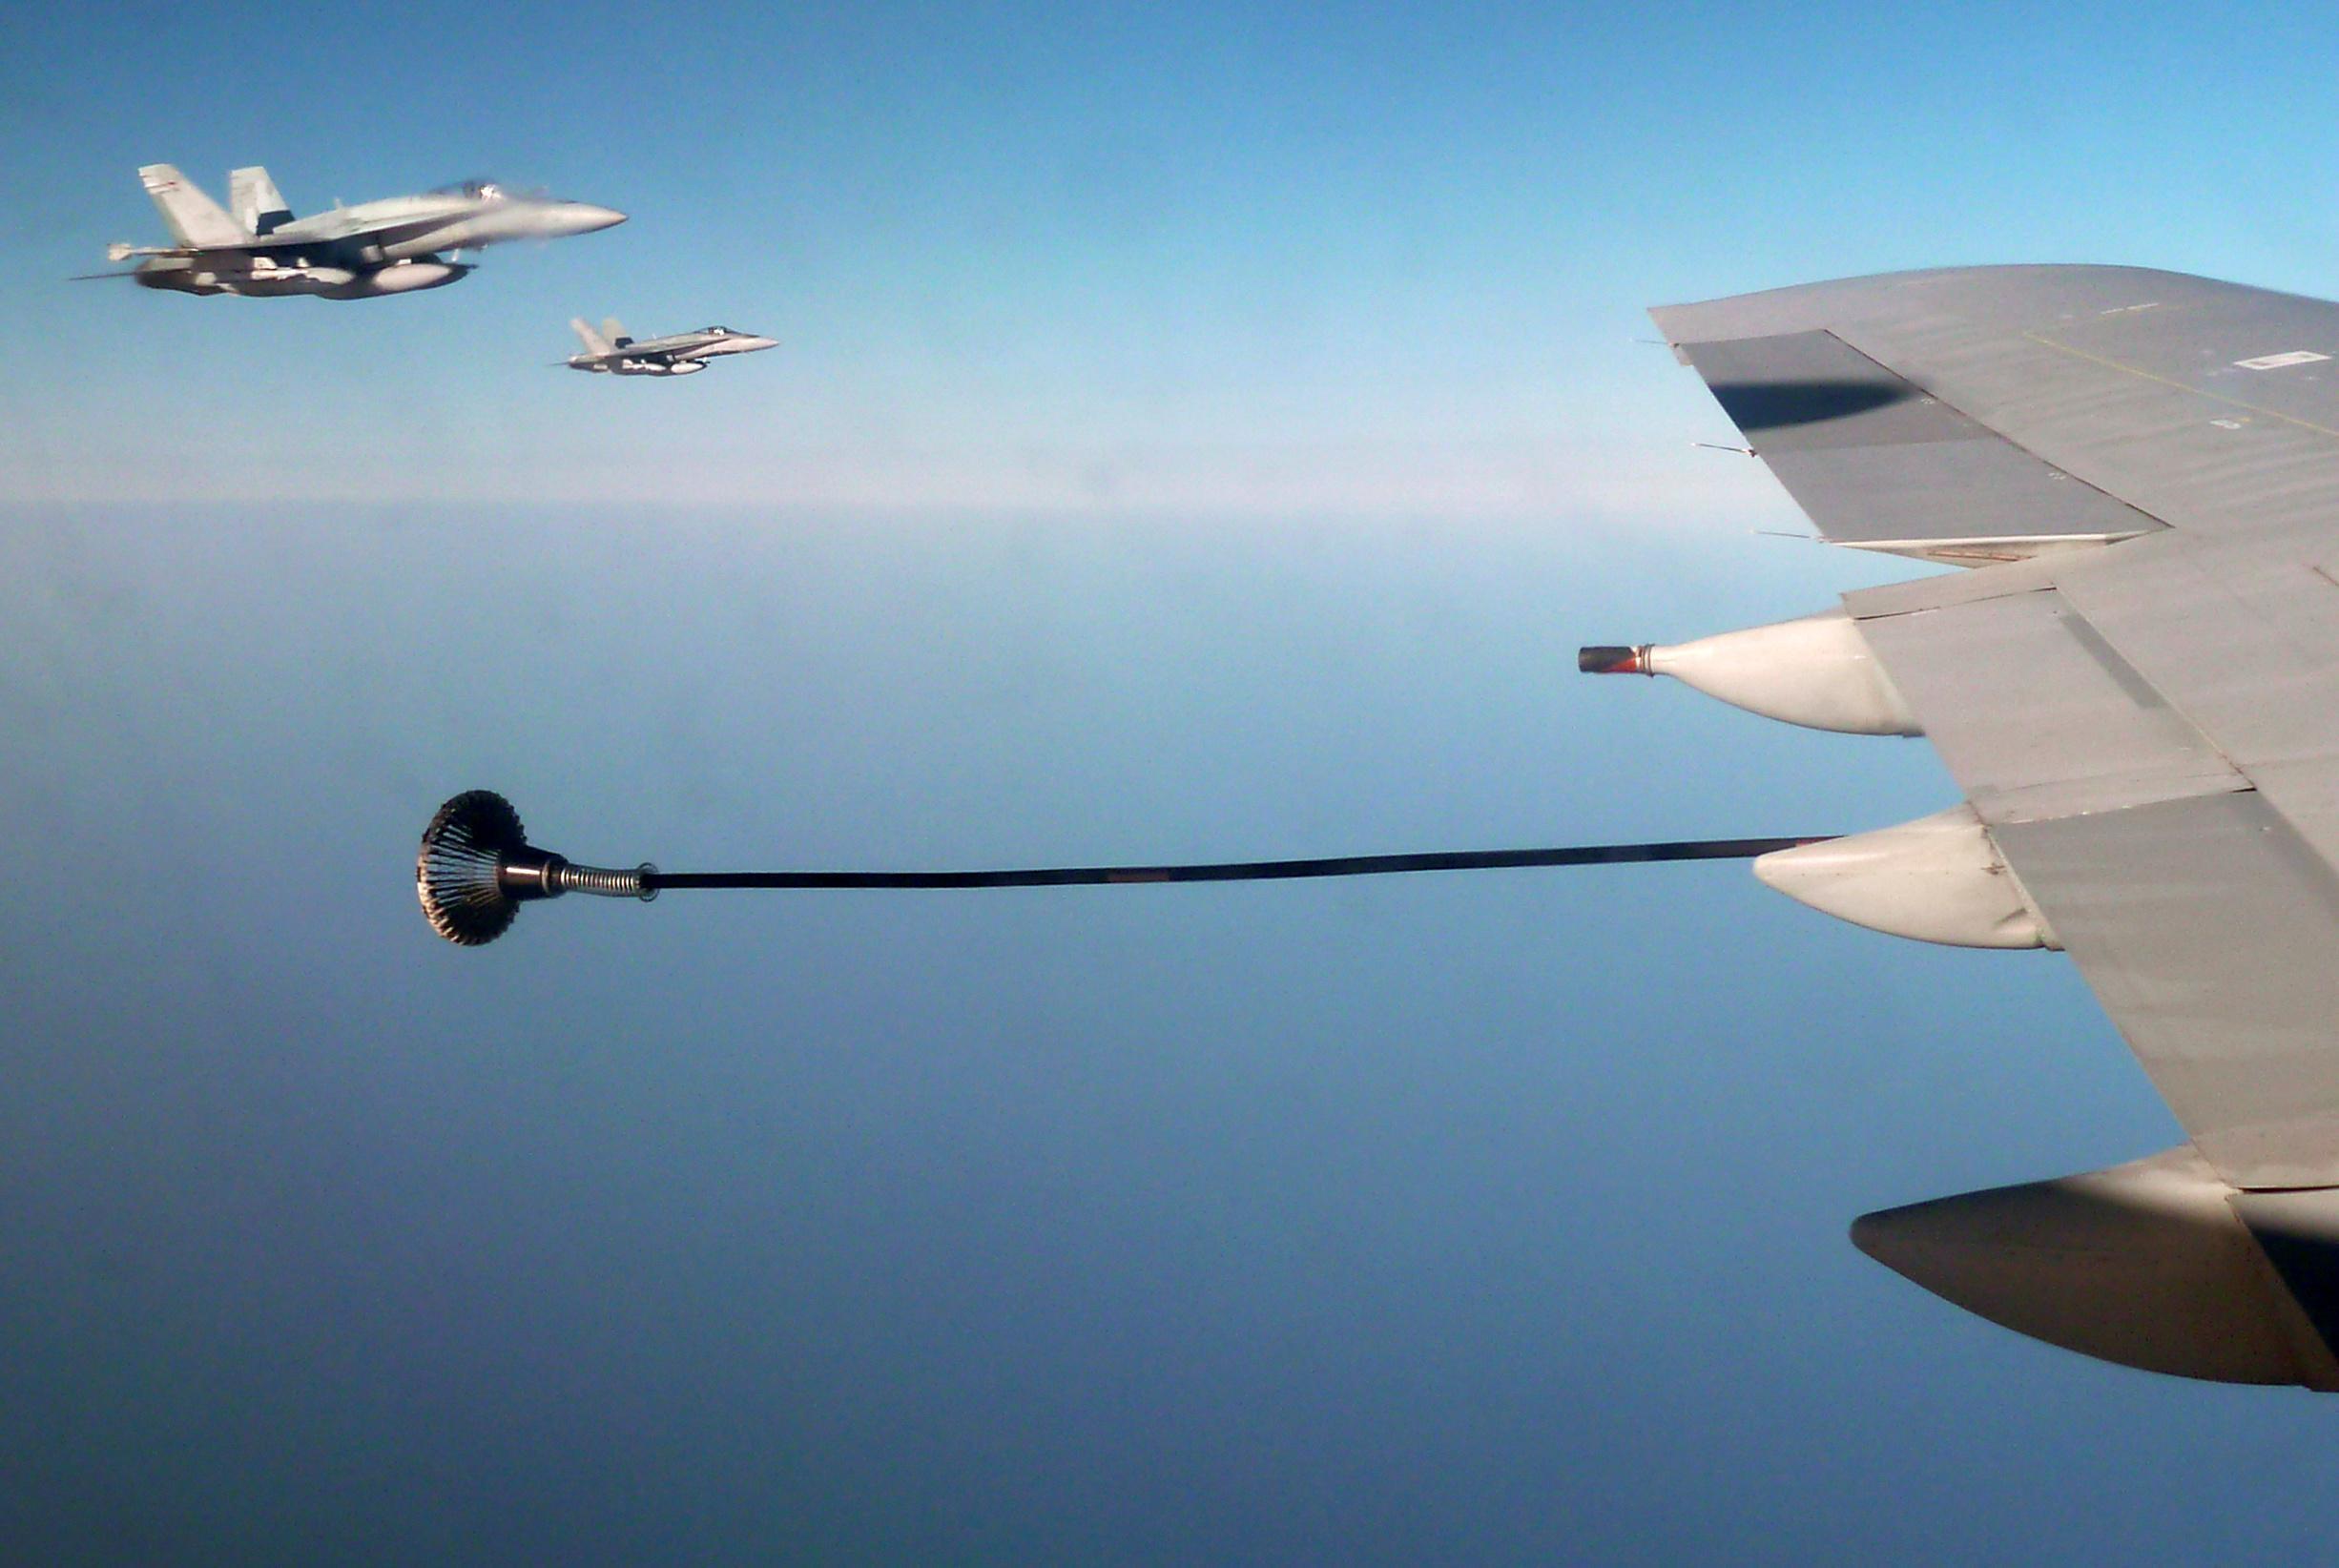 Britain to investigate $5 billion U.S. takeover of defense firm Cobham